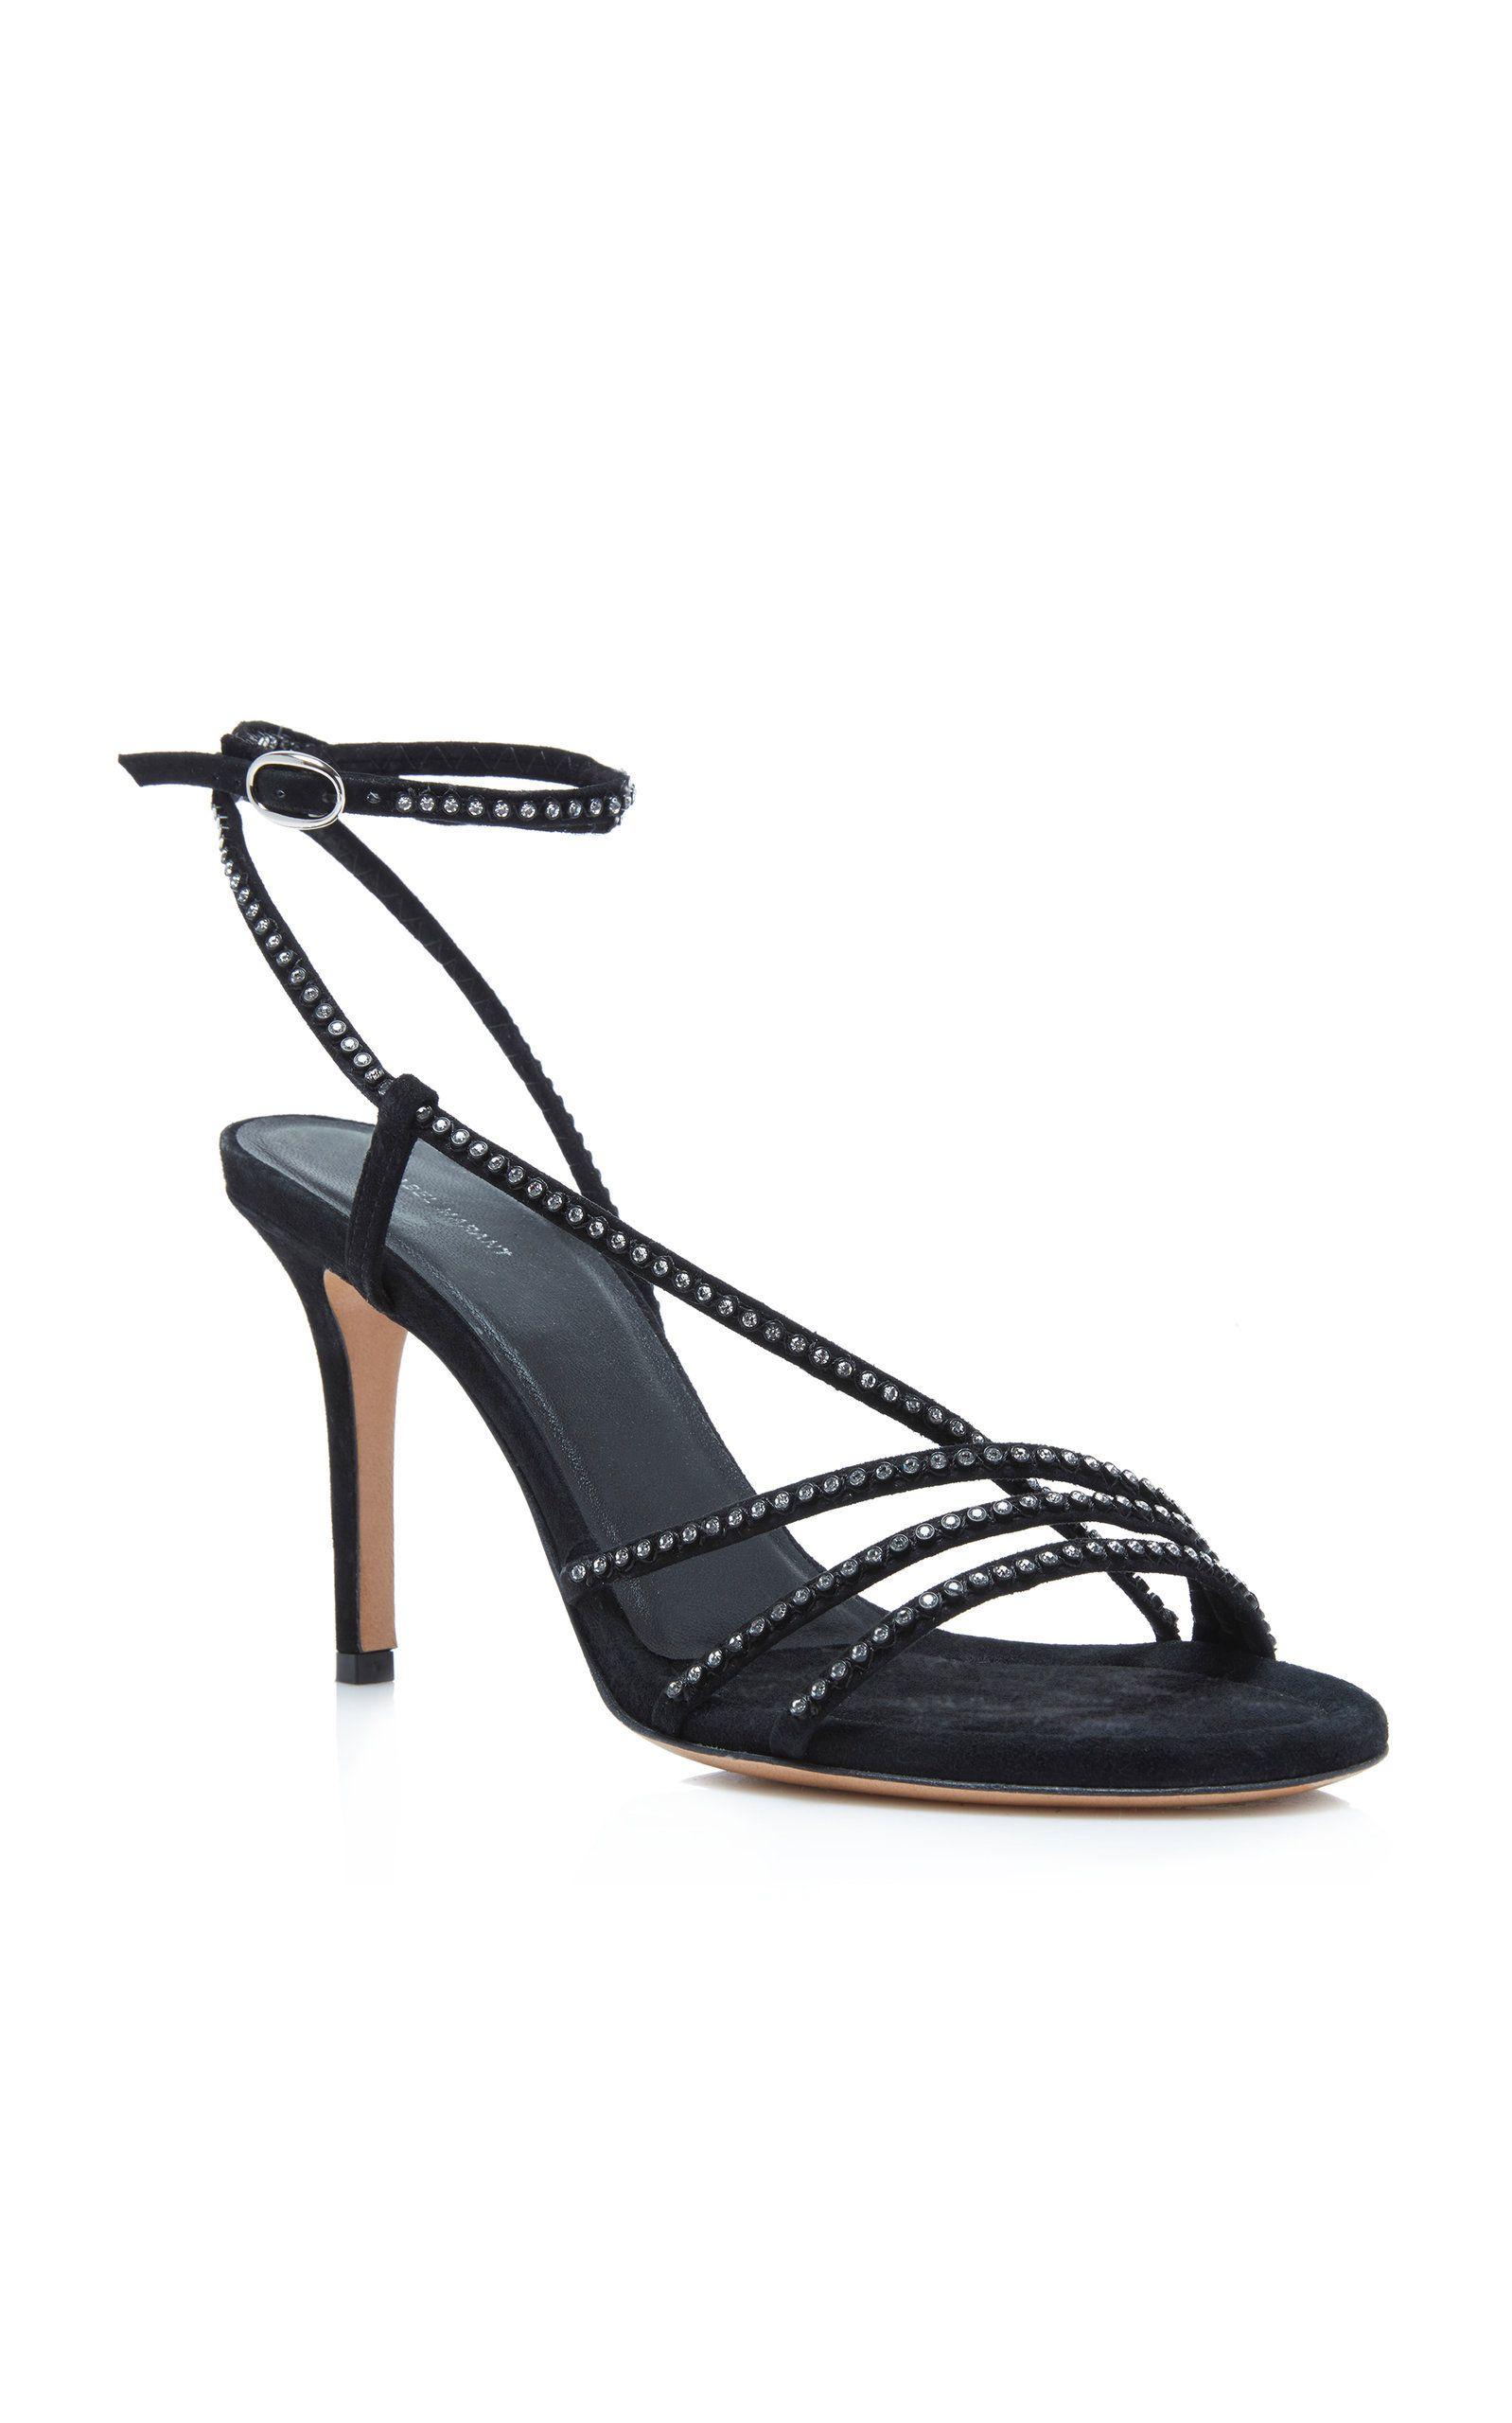 84d376a82 Click product to zoom Metallic Mini Dresses, Suede Sandals, Isabel Marant,  Stiletto Heels